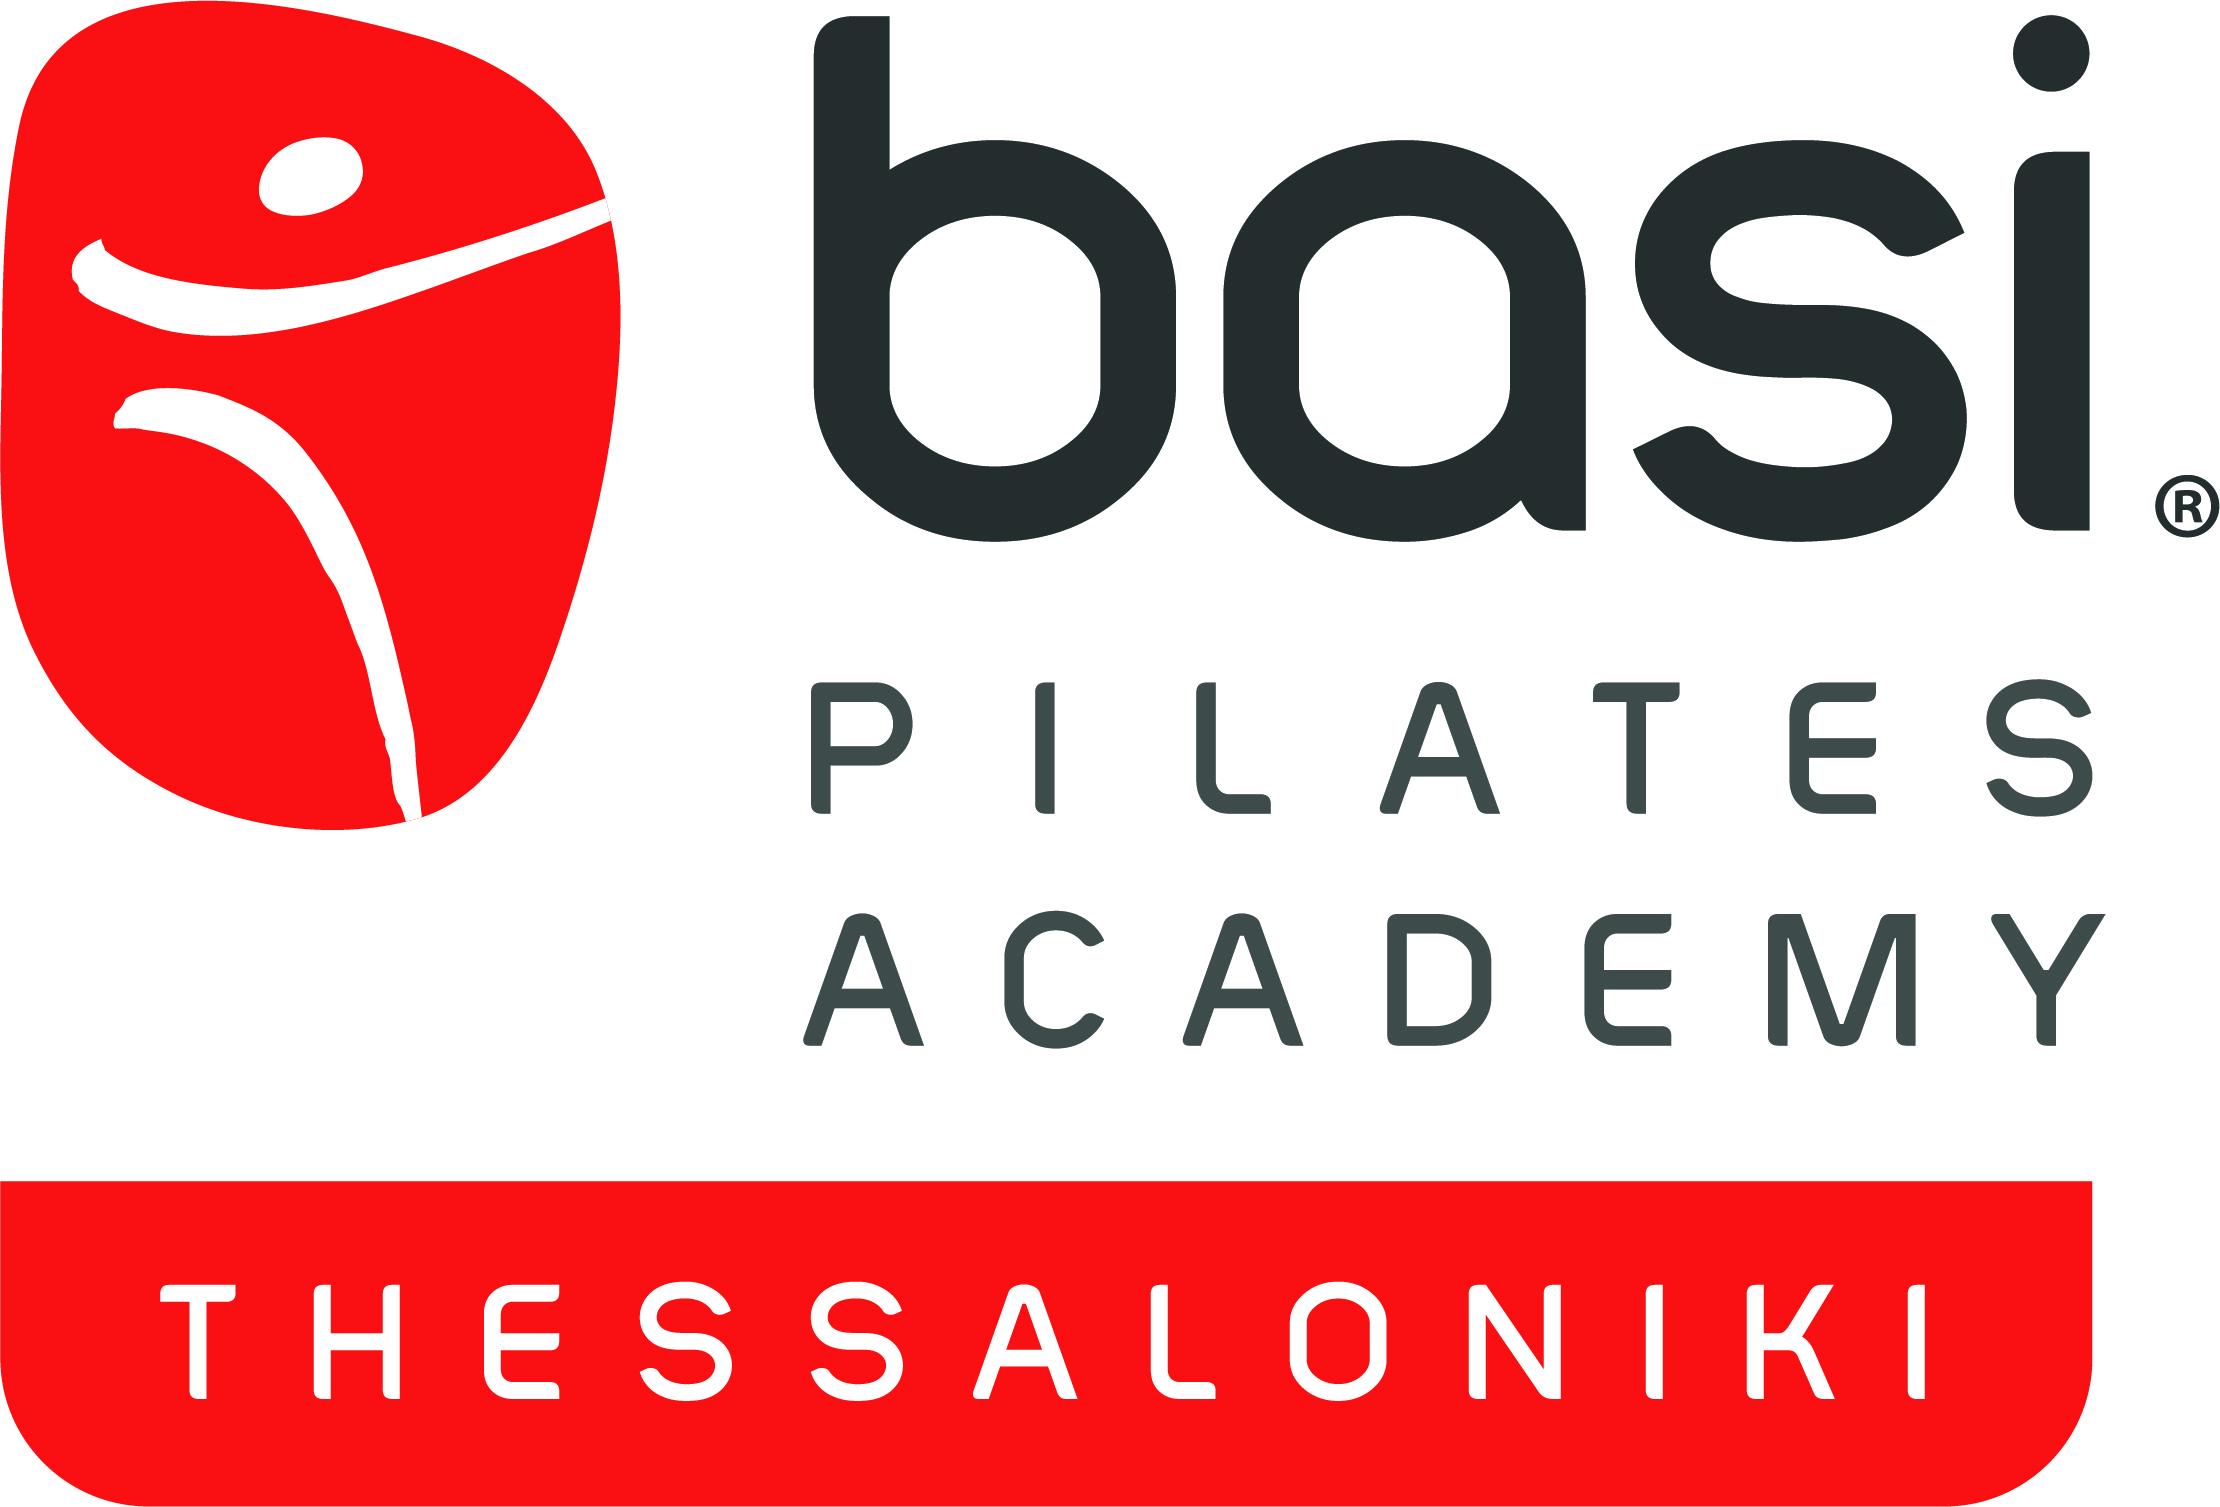 BASI Pilates Academy, Thessaloniki logo